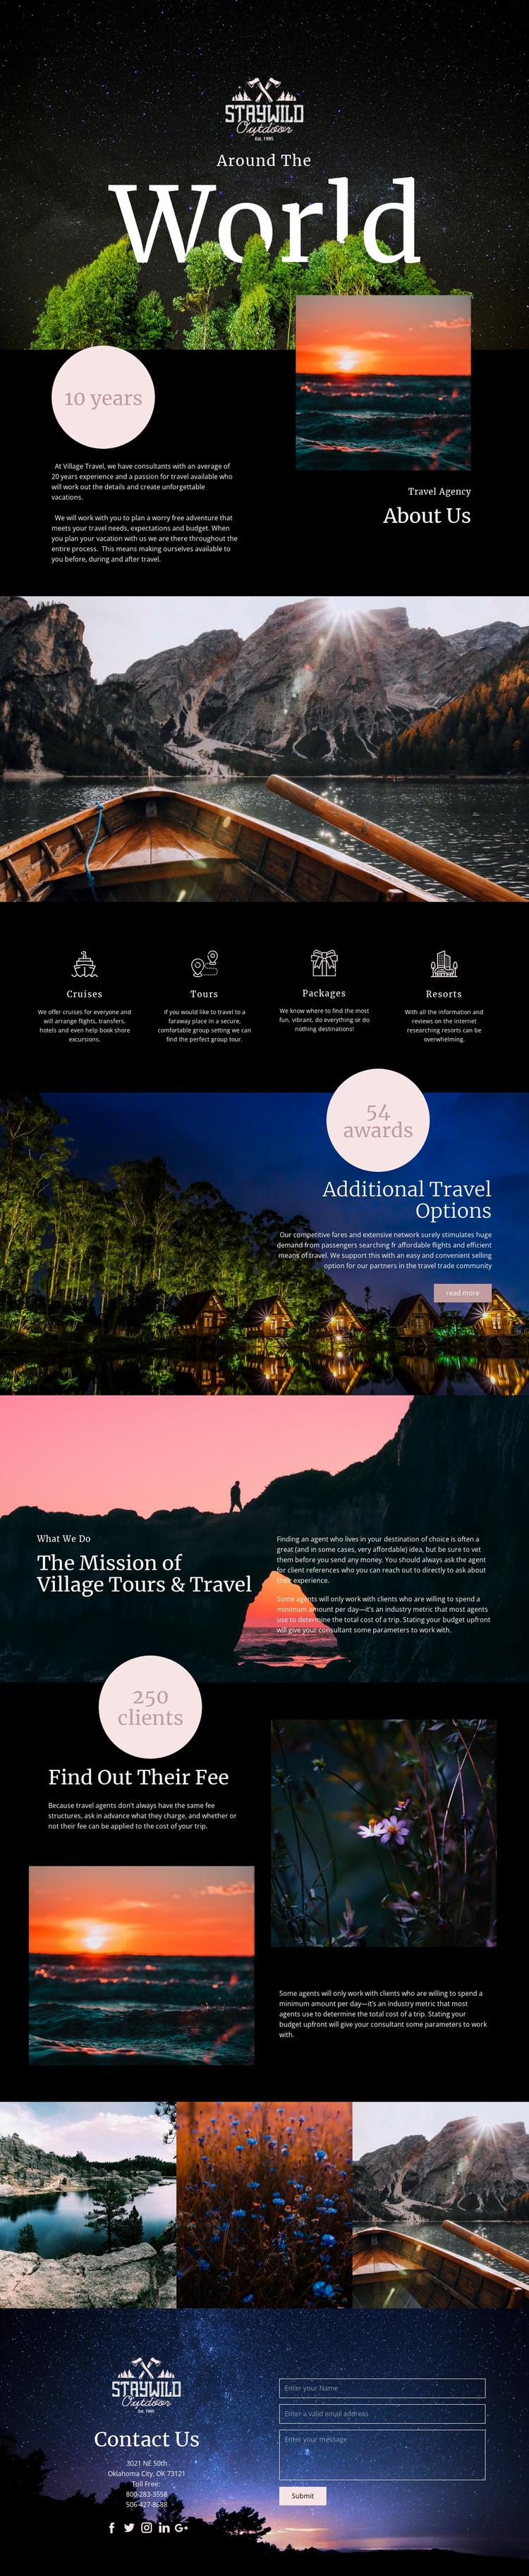 Around the World Website Template